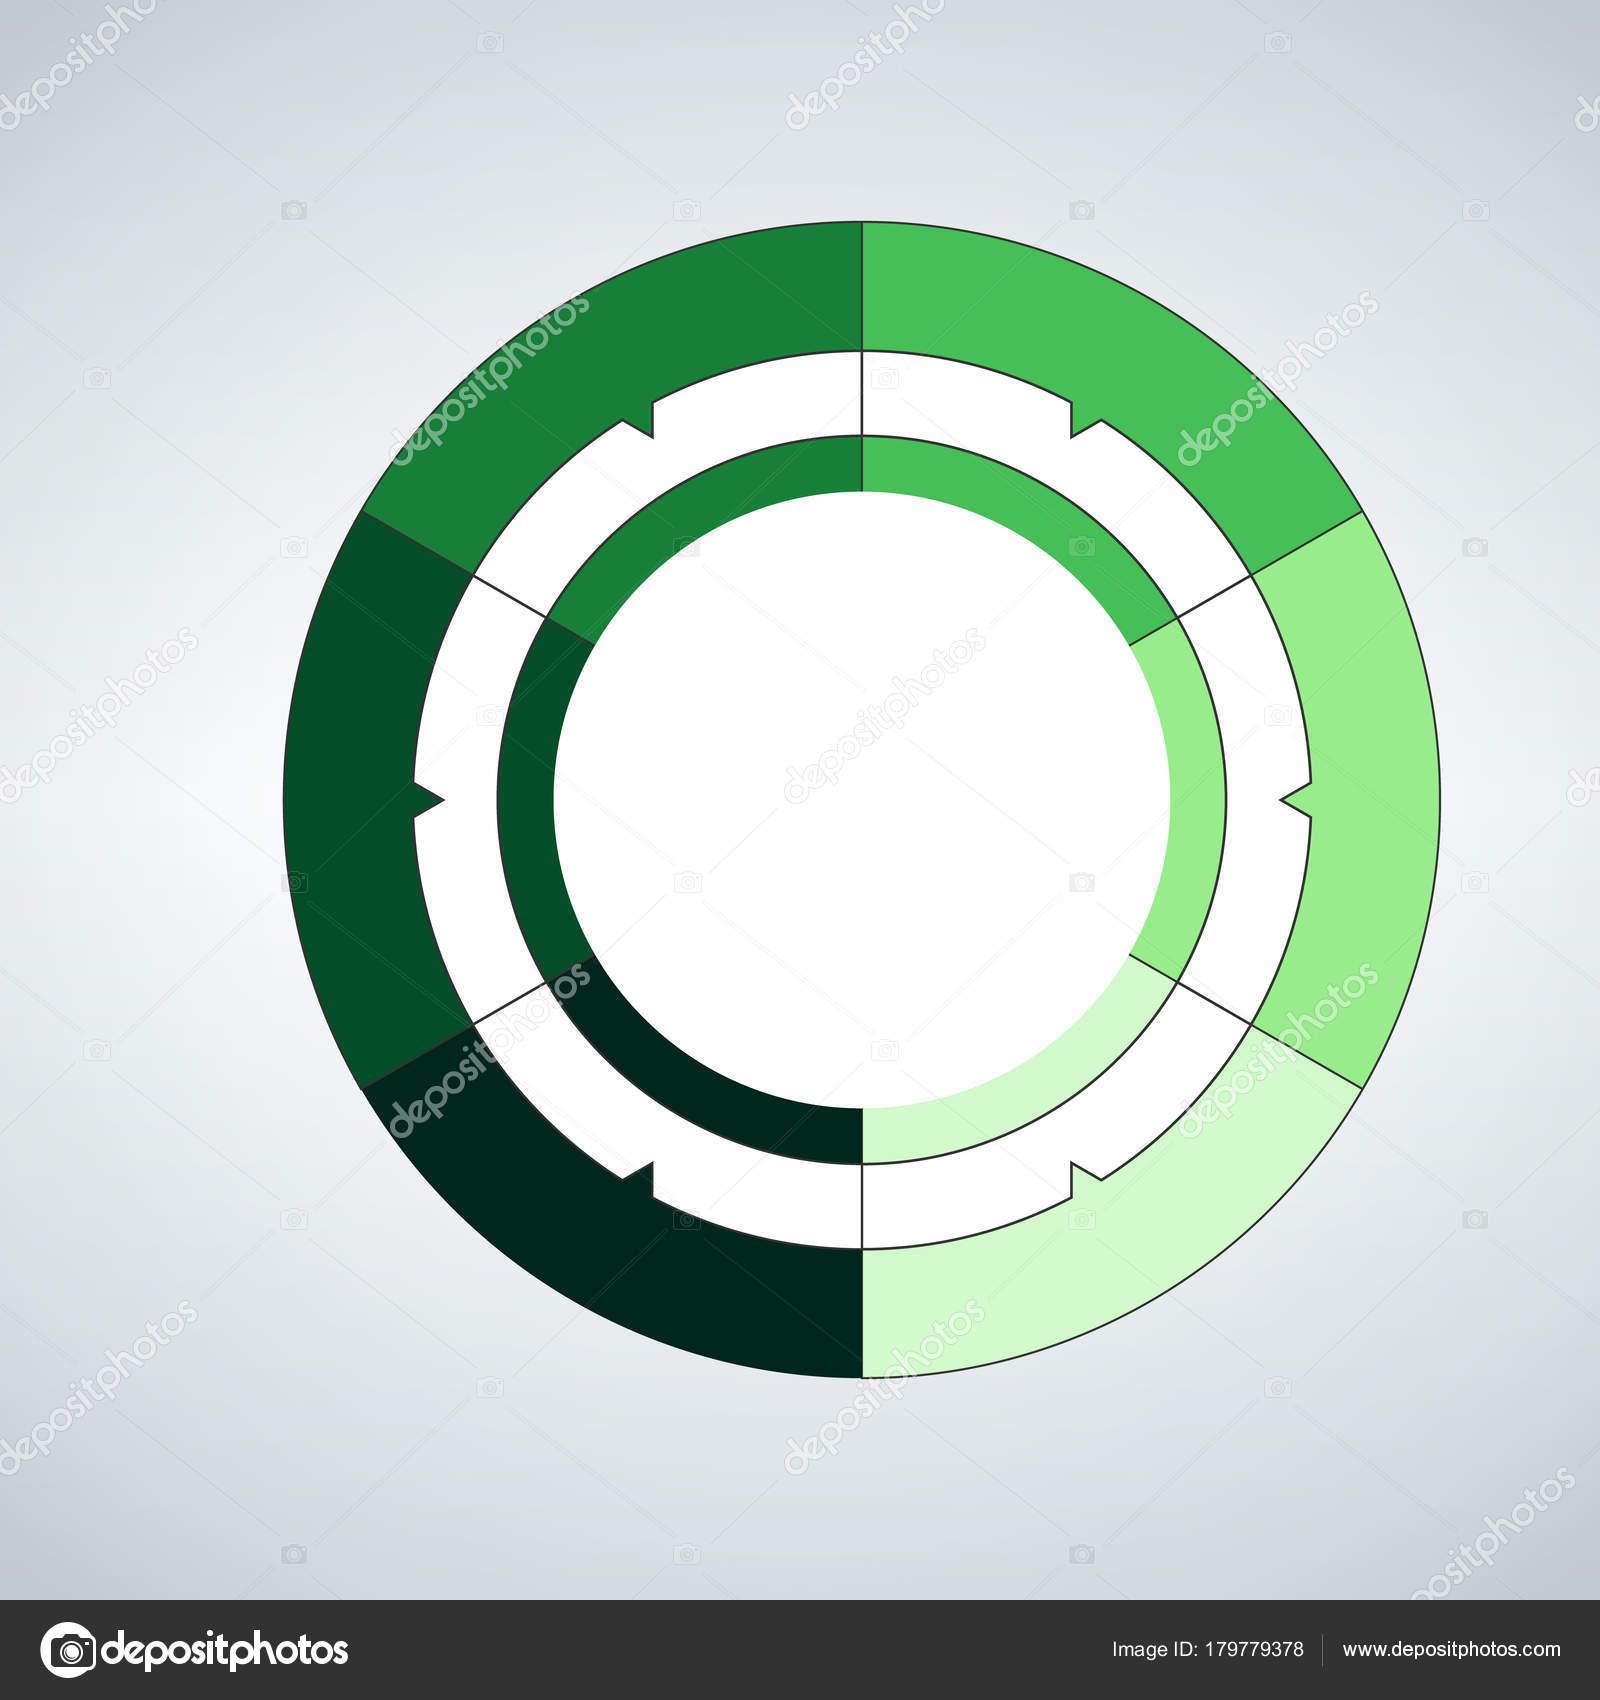 modelo de círculo de vetor para infográficos conceito de negócio